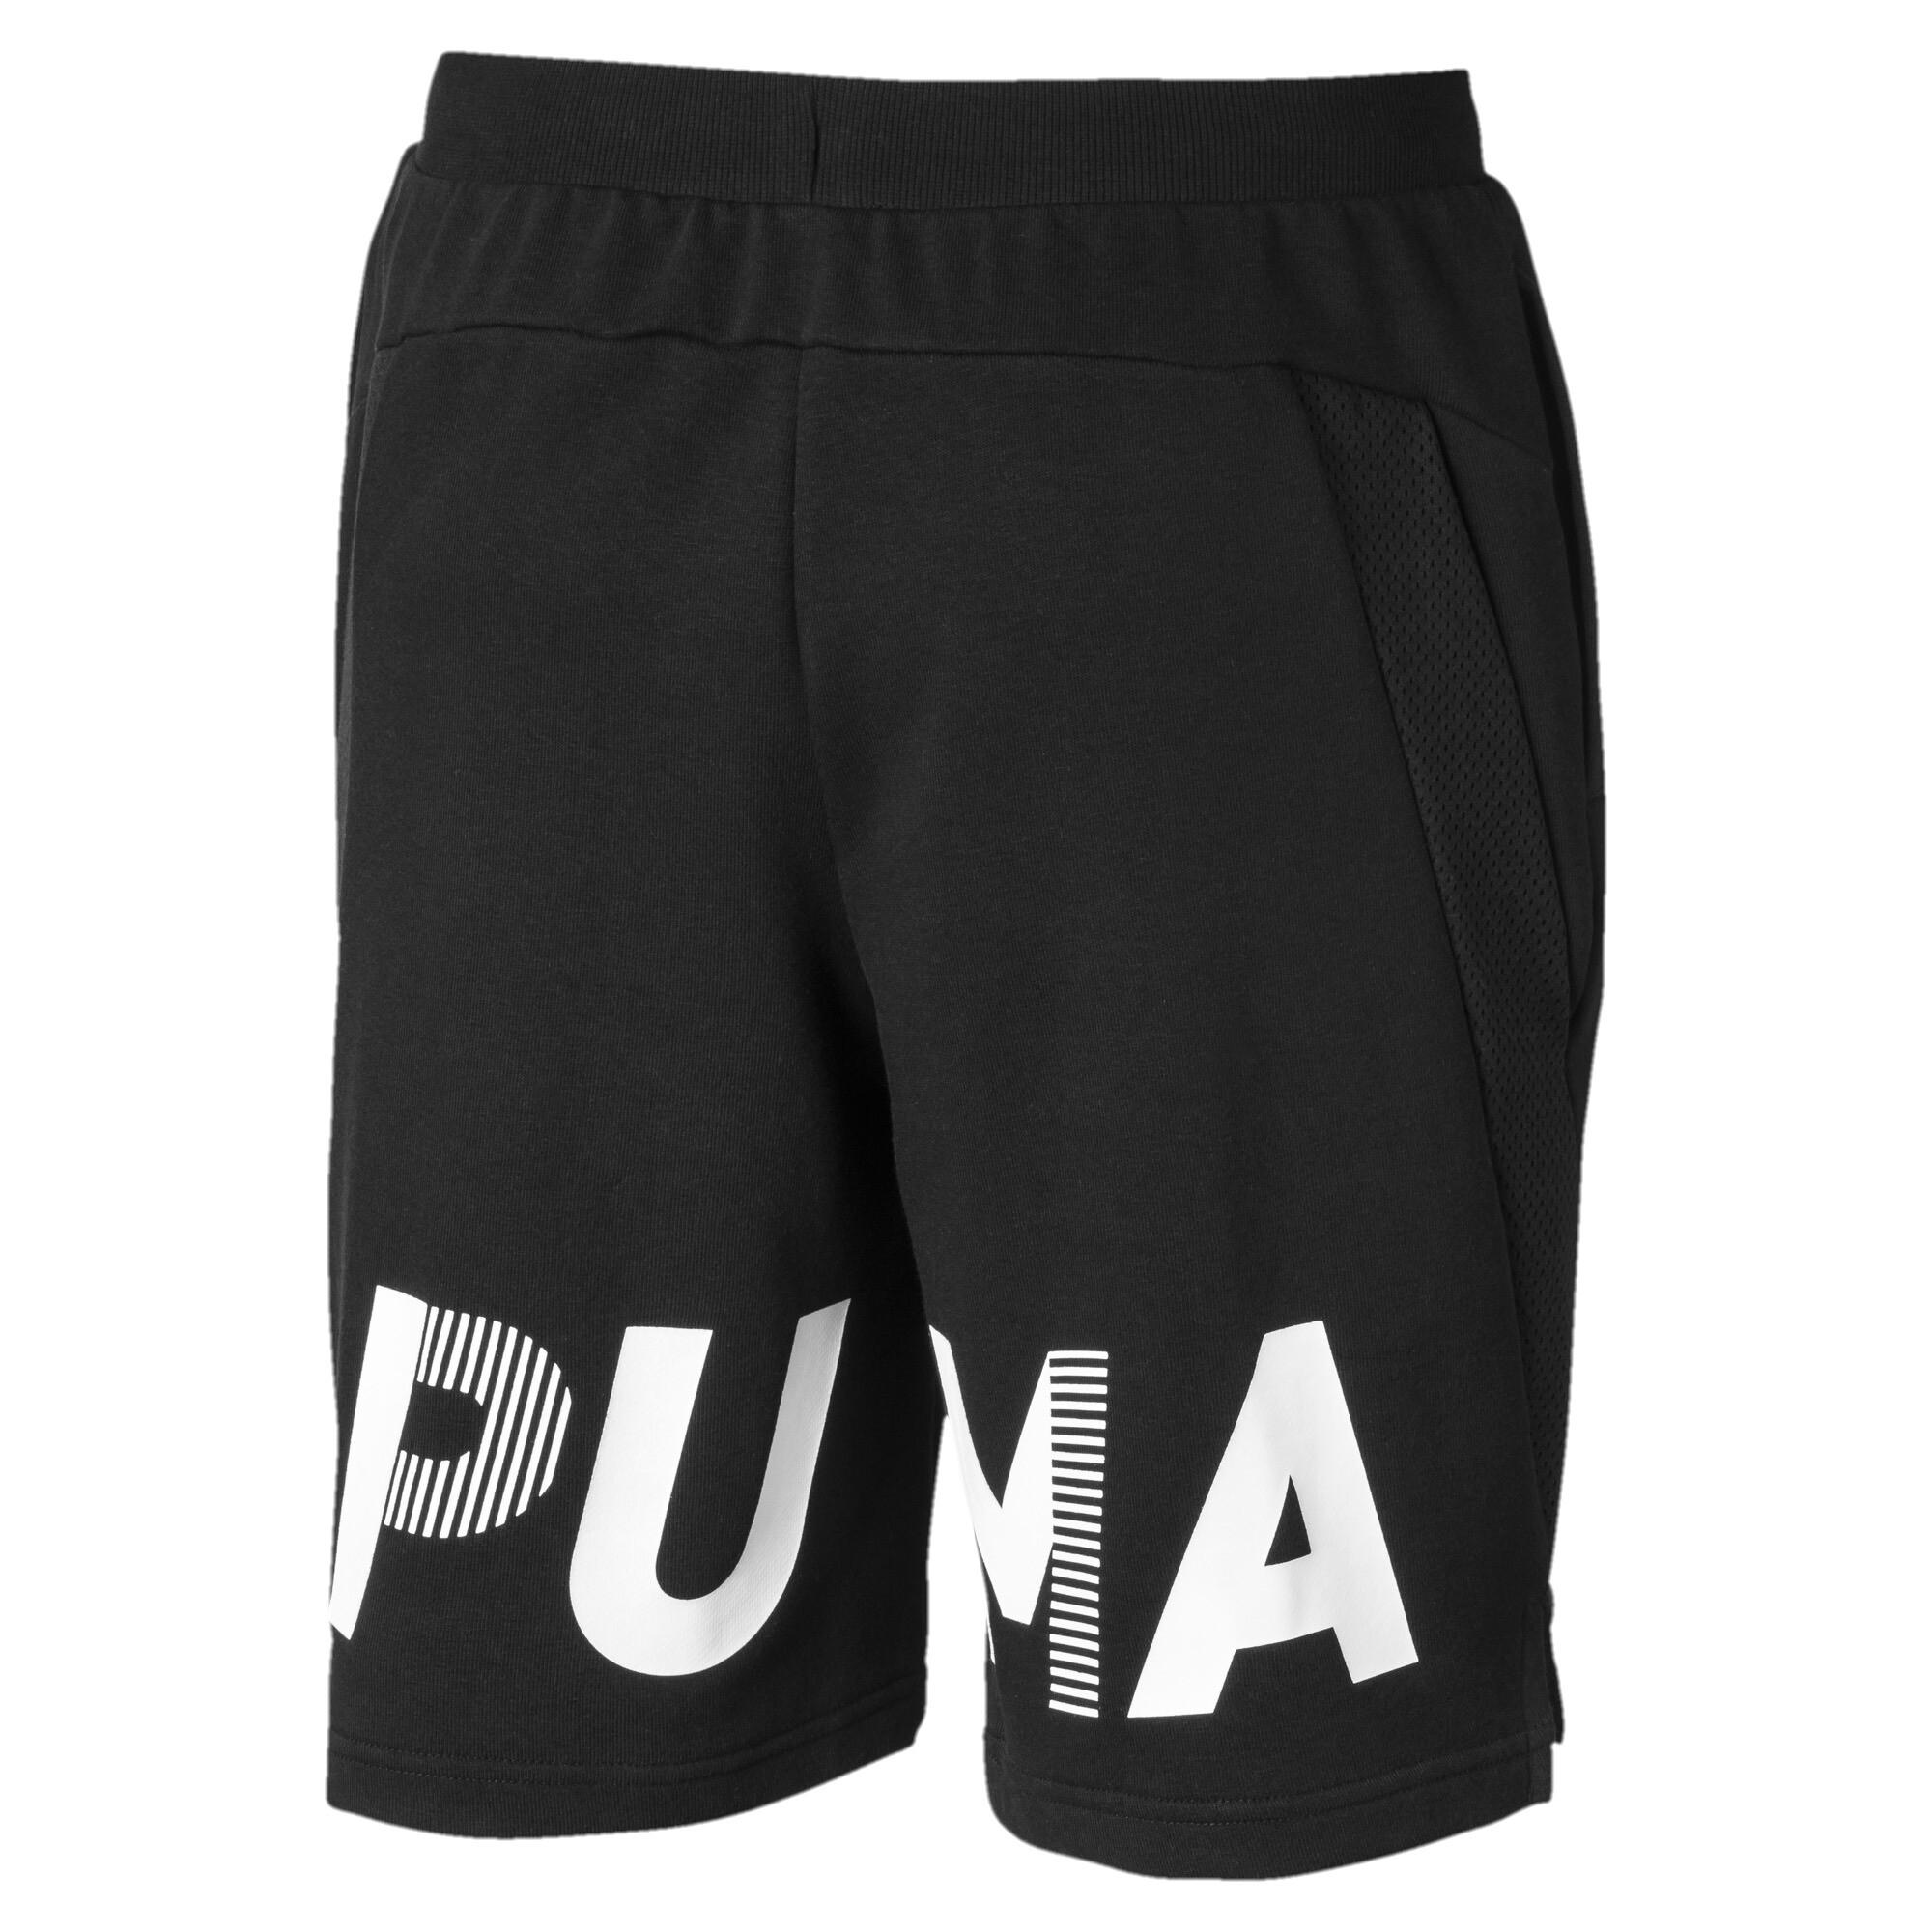 PUMA-Modern-Sports-Men-039-s-Shorts-Men-Knitted-Shorts-Basics thumbnail 3